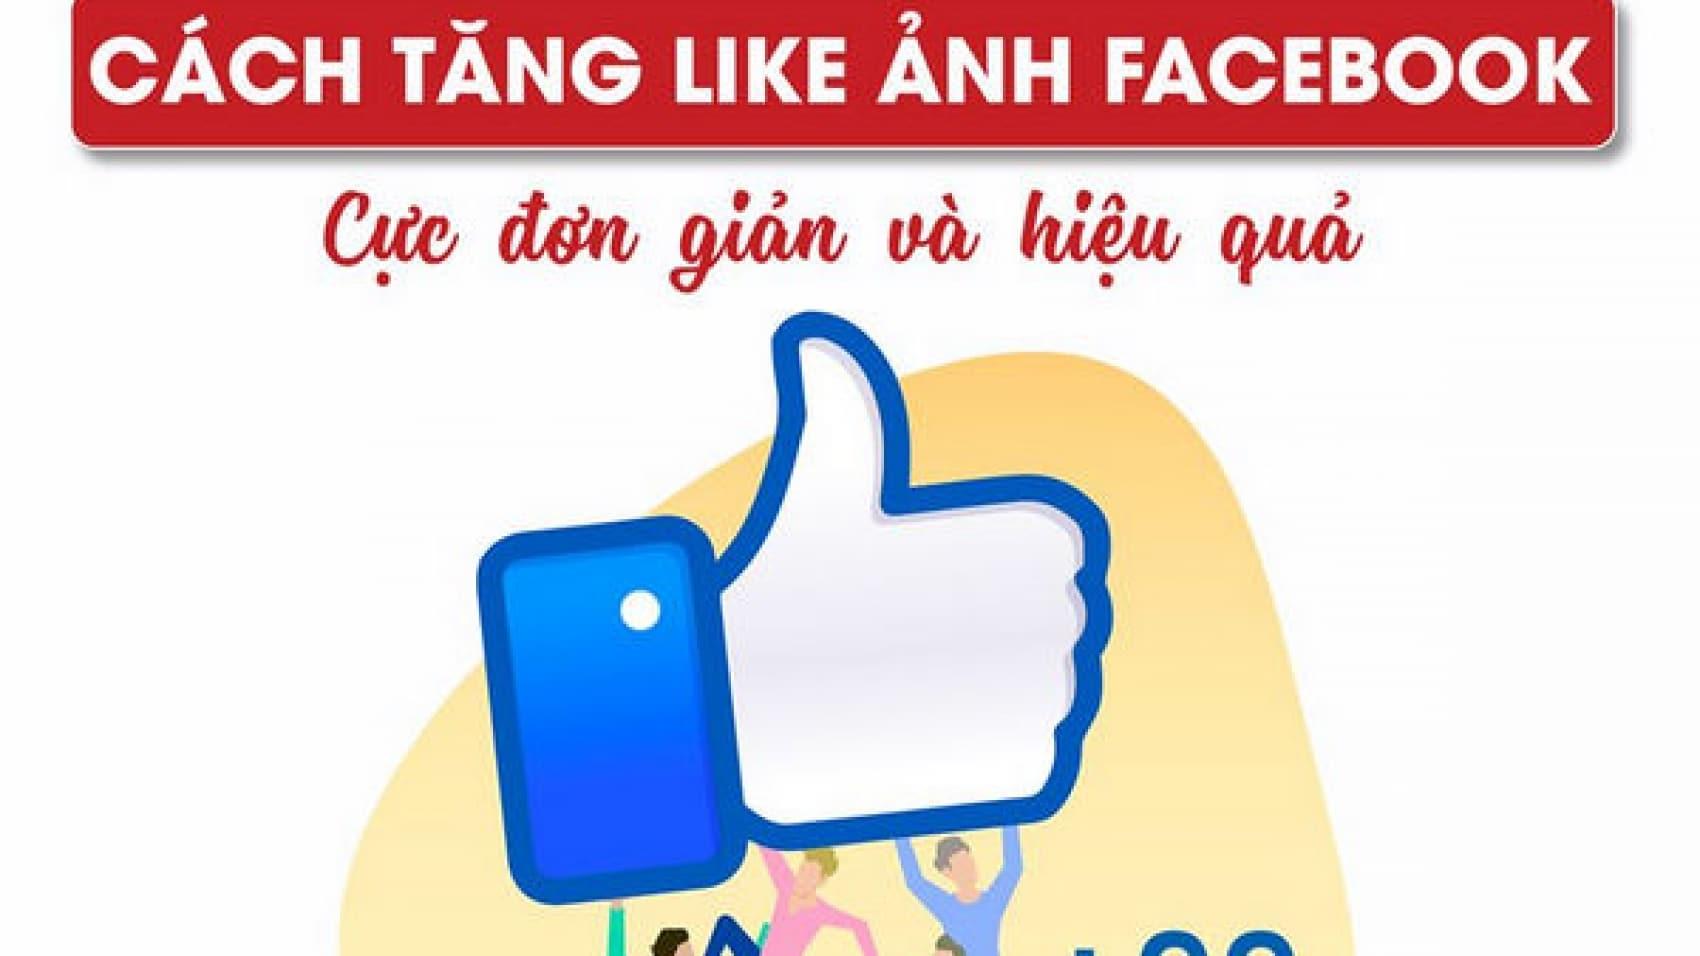 Website trao đổi like uy tín (11)